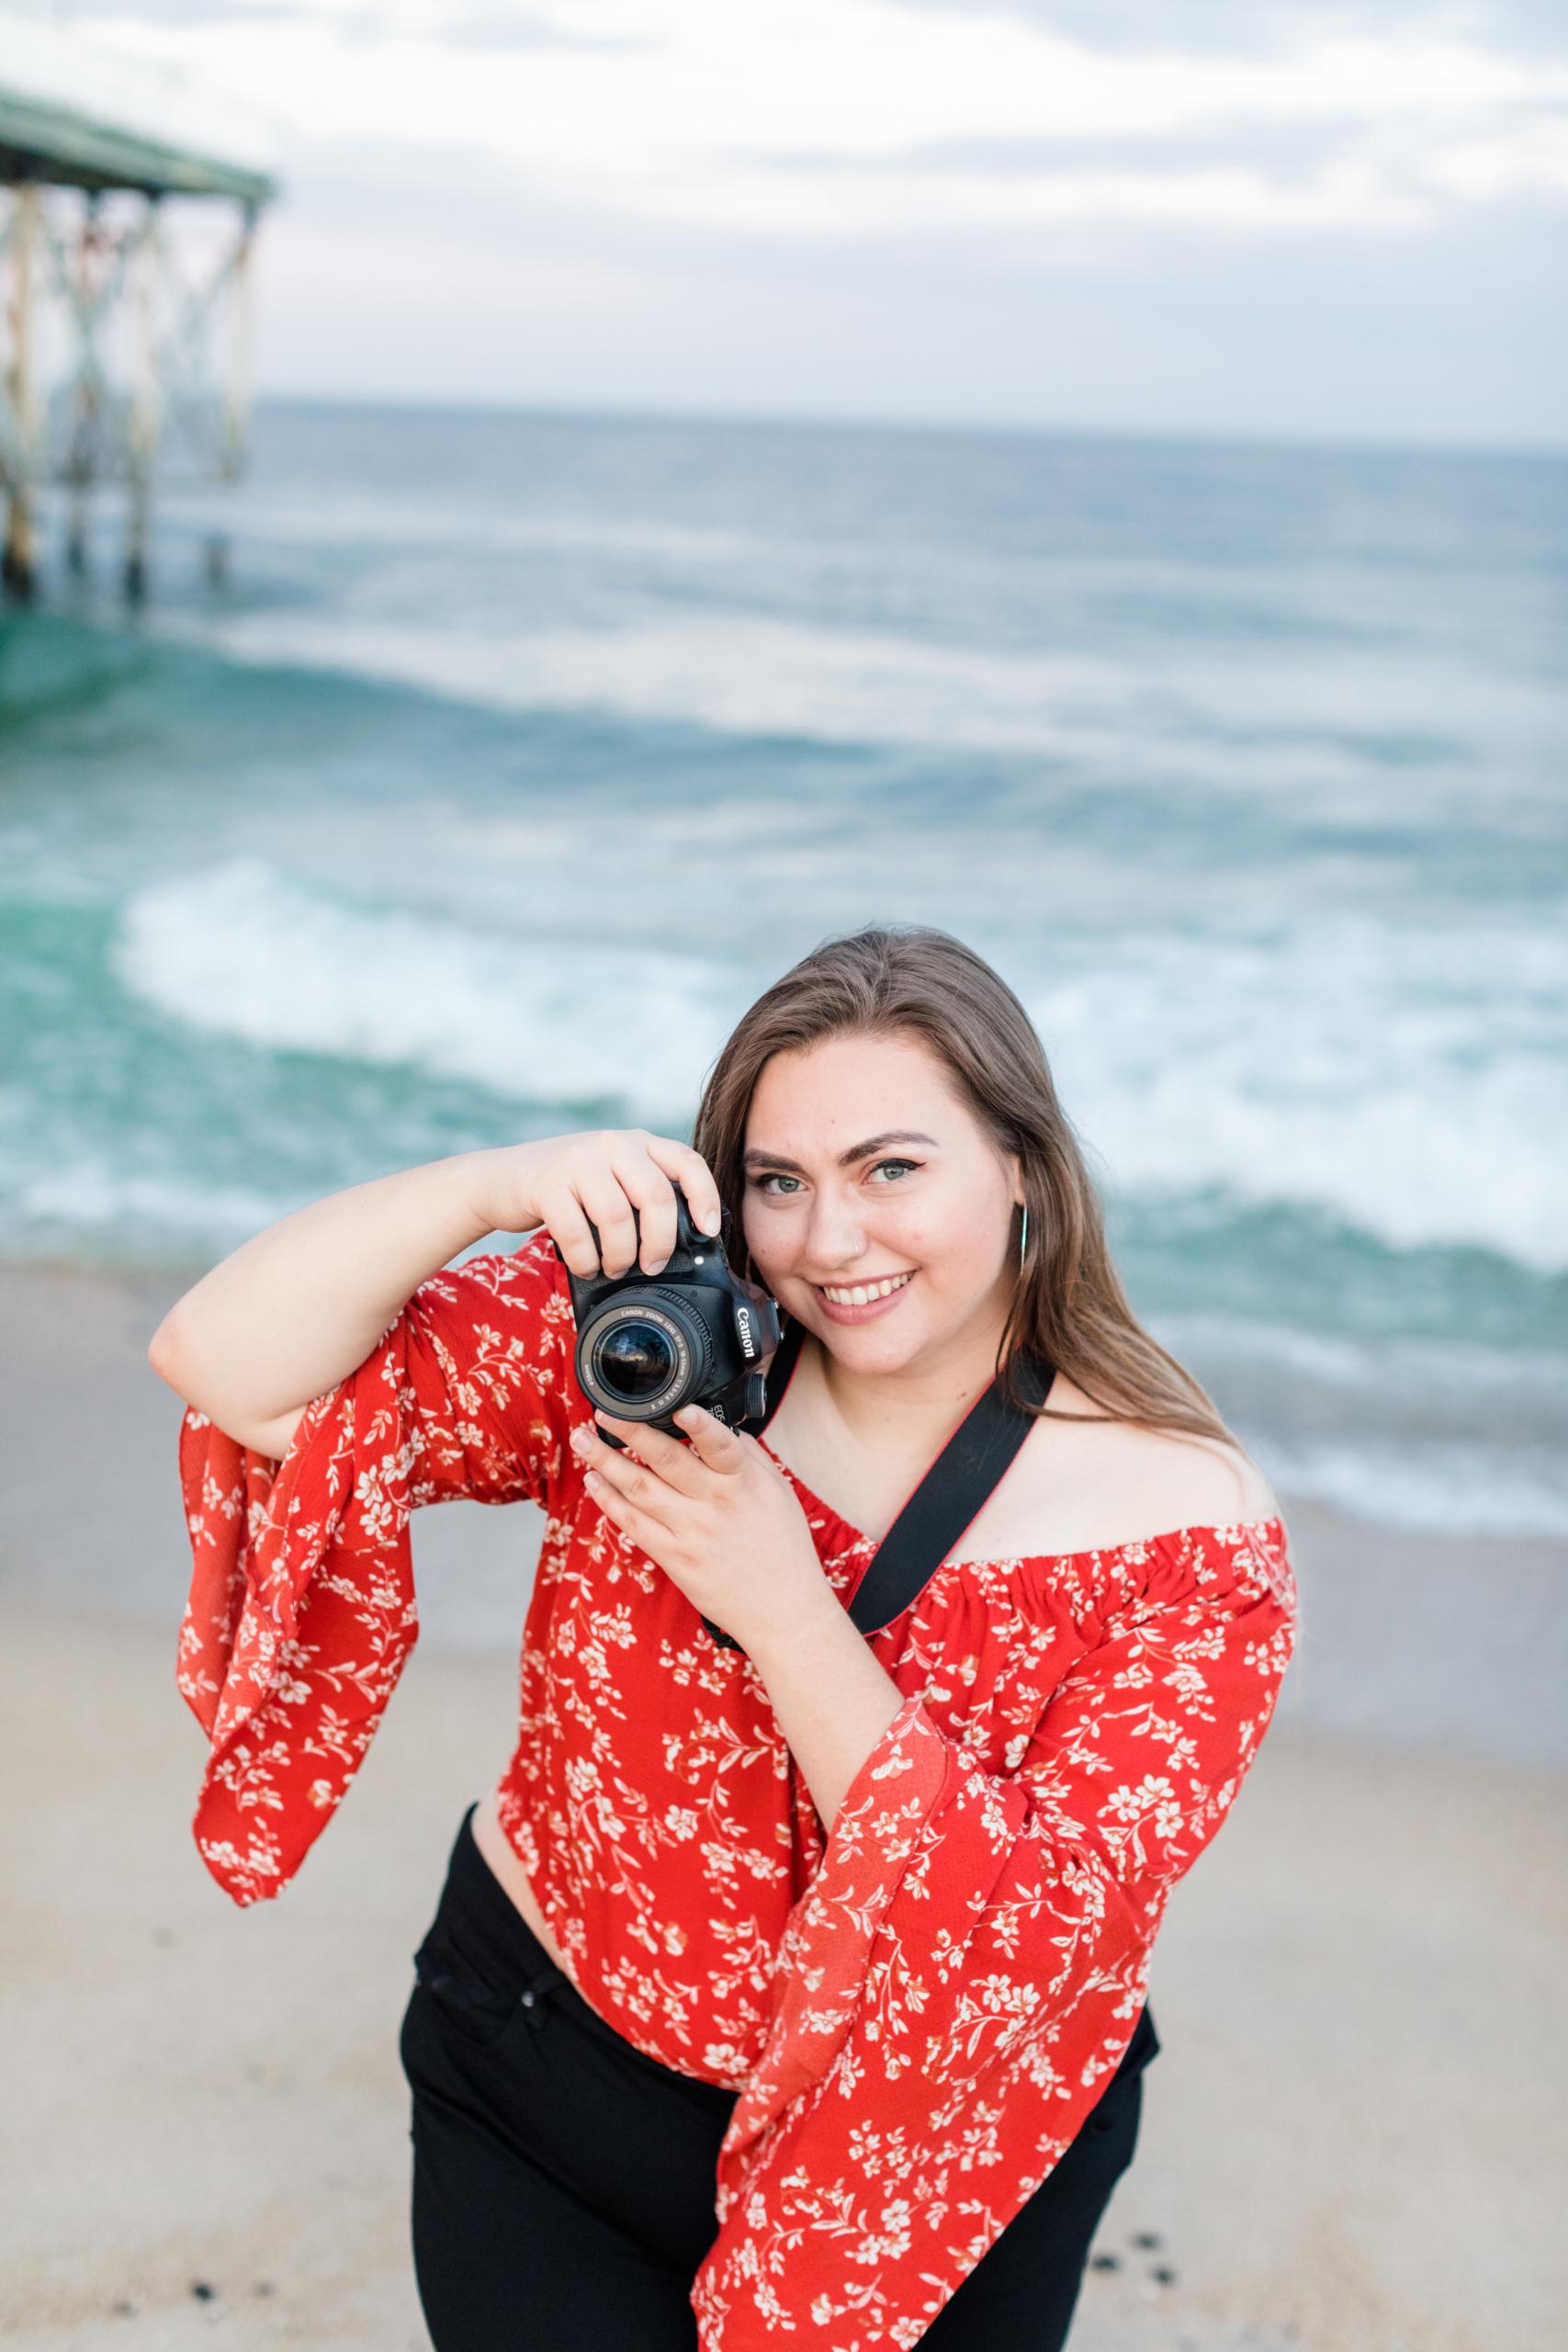 Kristen Miller Photography Assistant